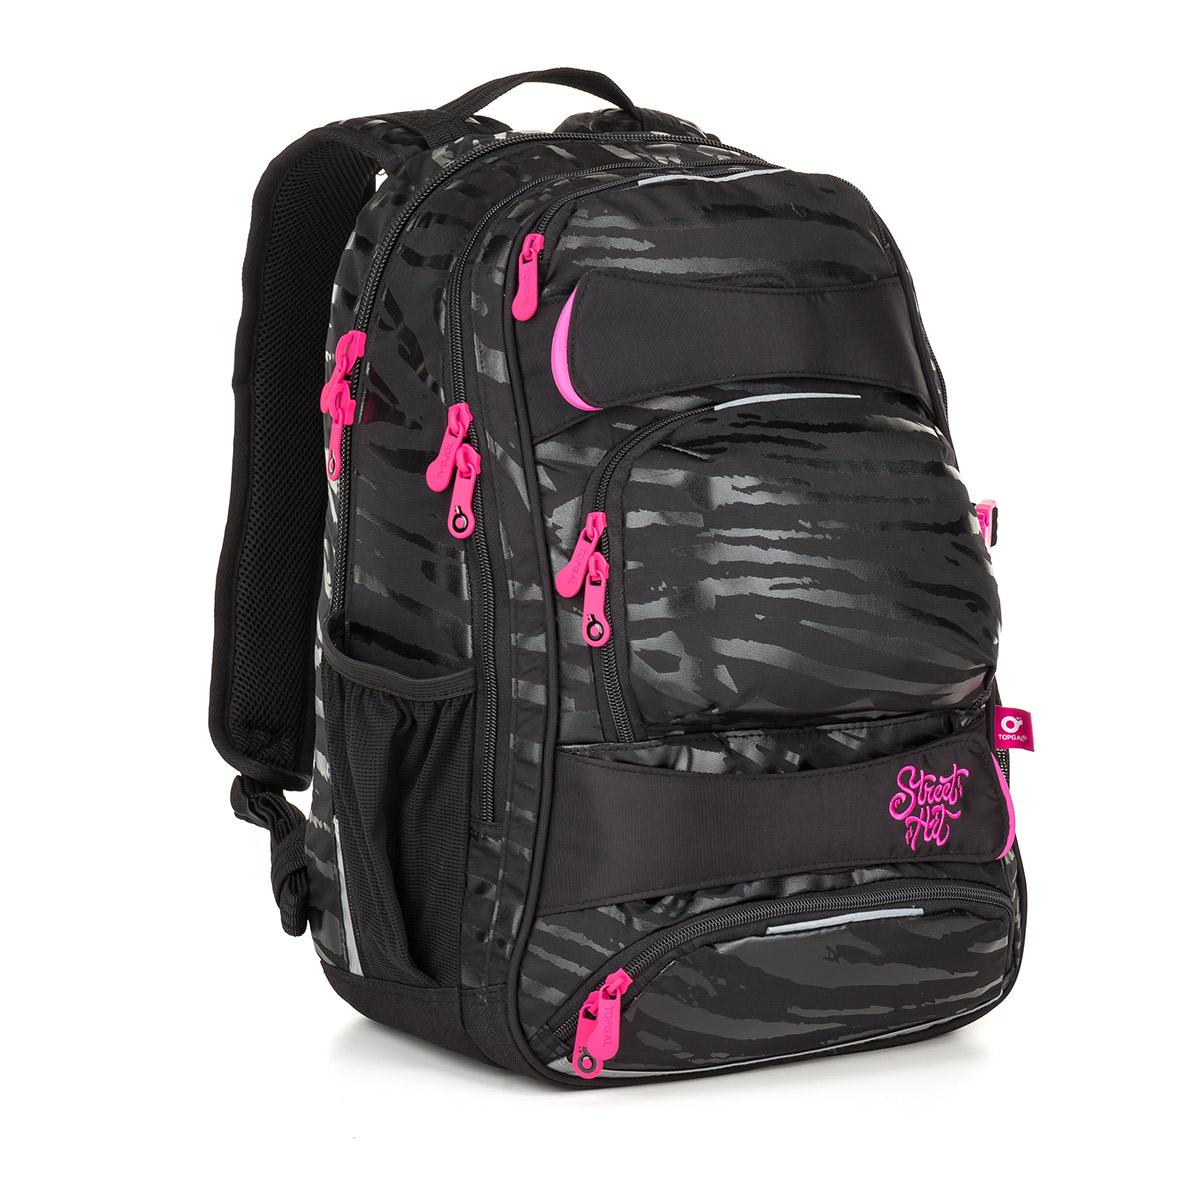 Studentský batoh Topgal YUMI 18038 G